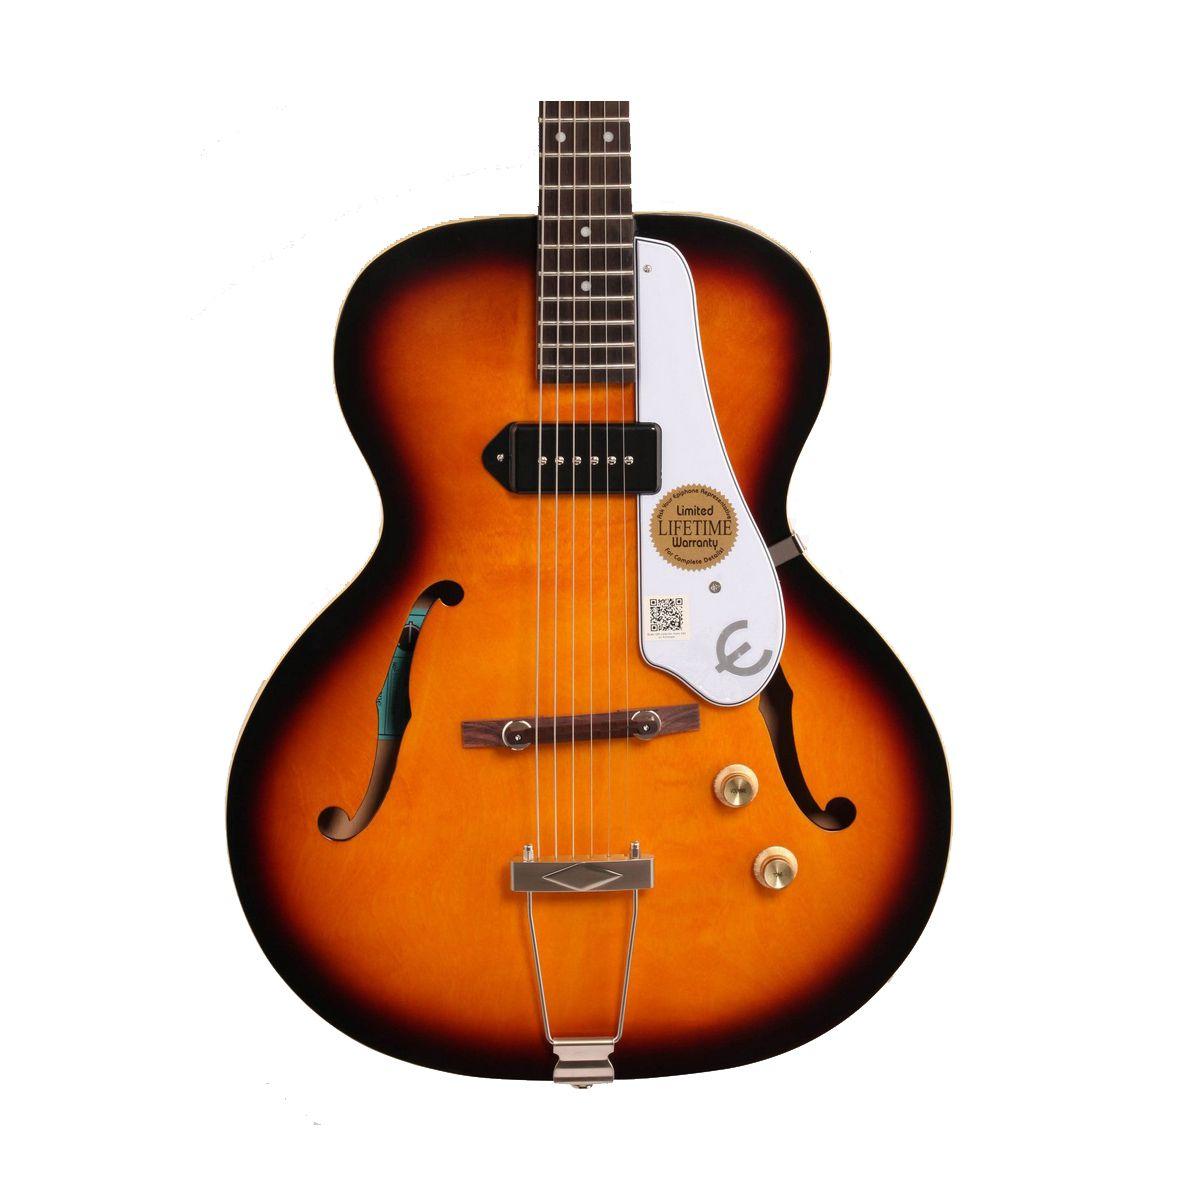 Guitarra Semi-Acústica Epiphone Century 1966 Aged Gloss